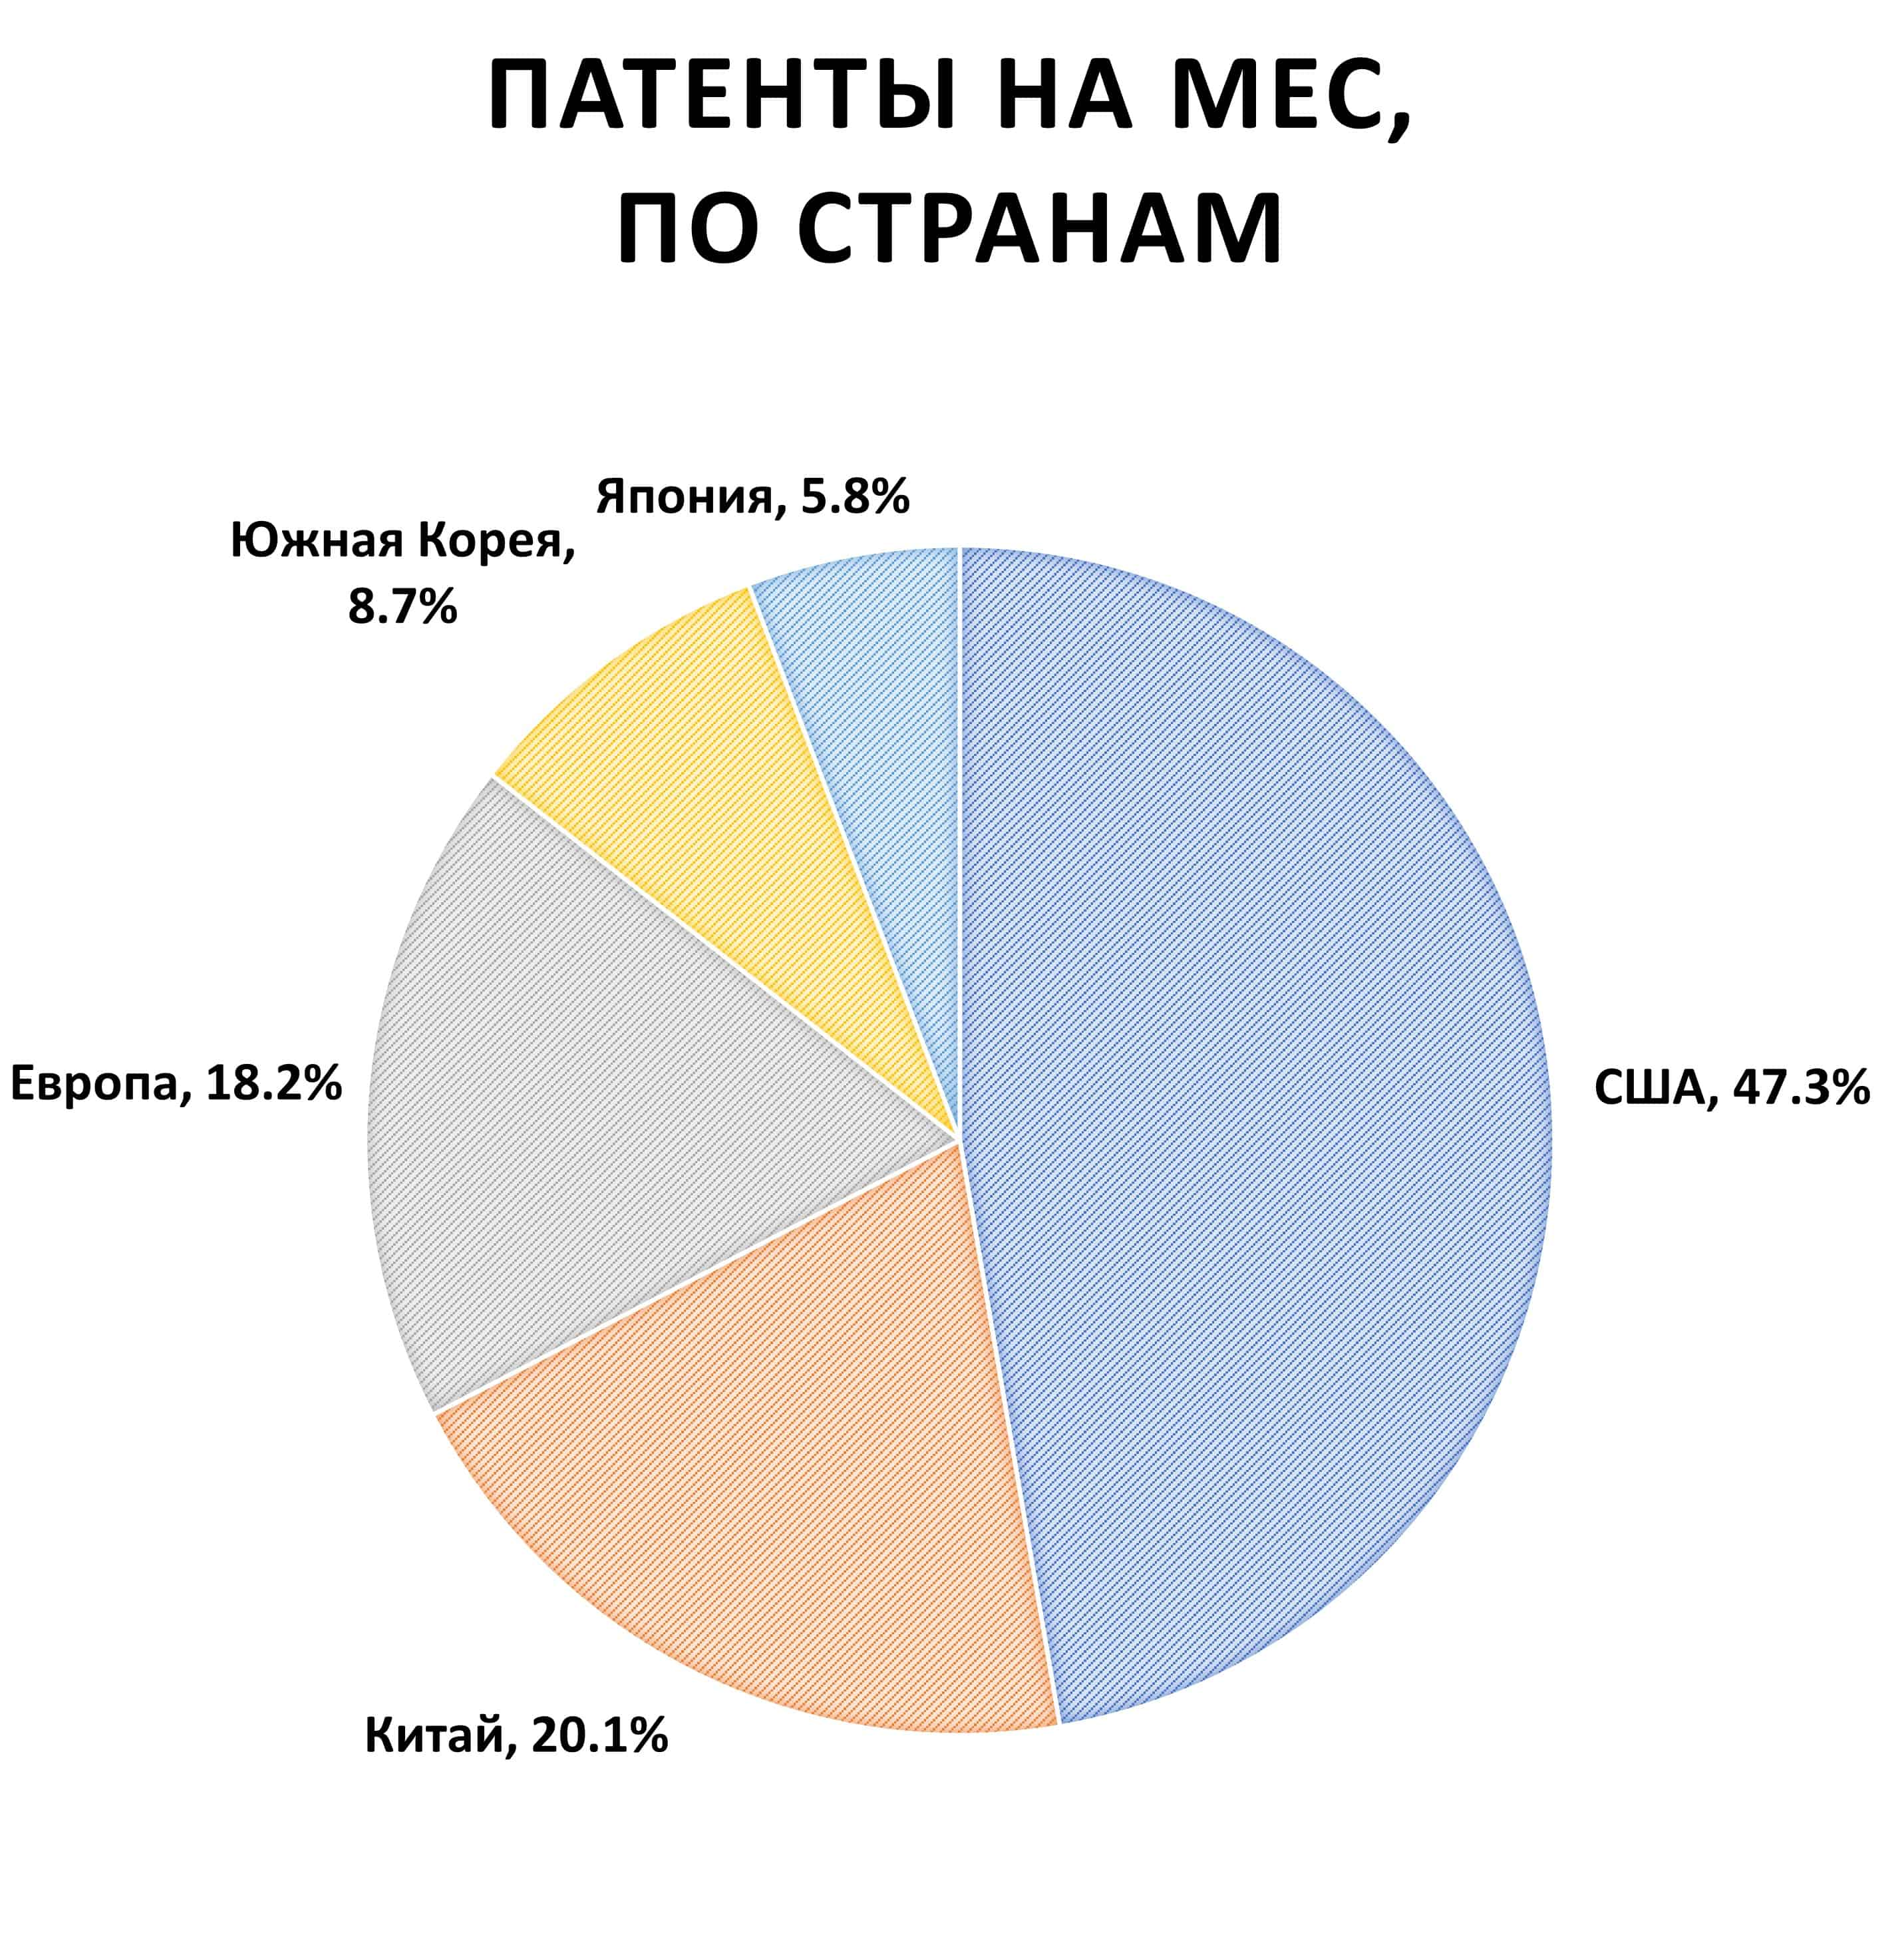 Патенты на MEC, по странам. США 47,3%, Китай 20,1%, Европа 18,2%, Южная Корея 8,7%, Япония 5,8%.